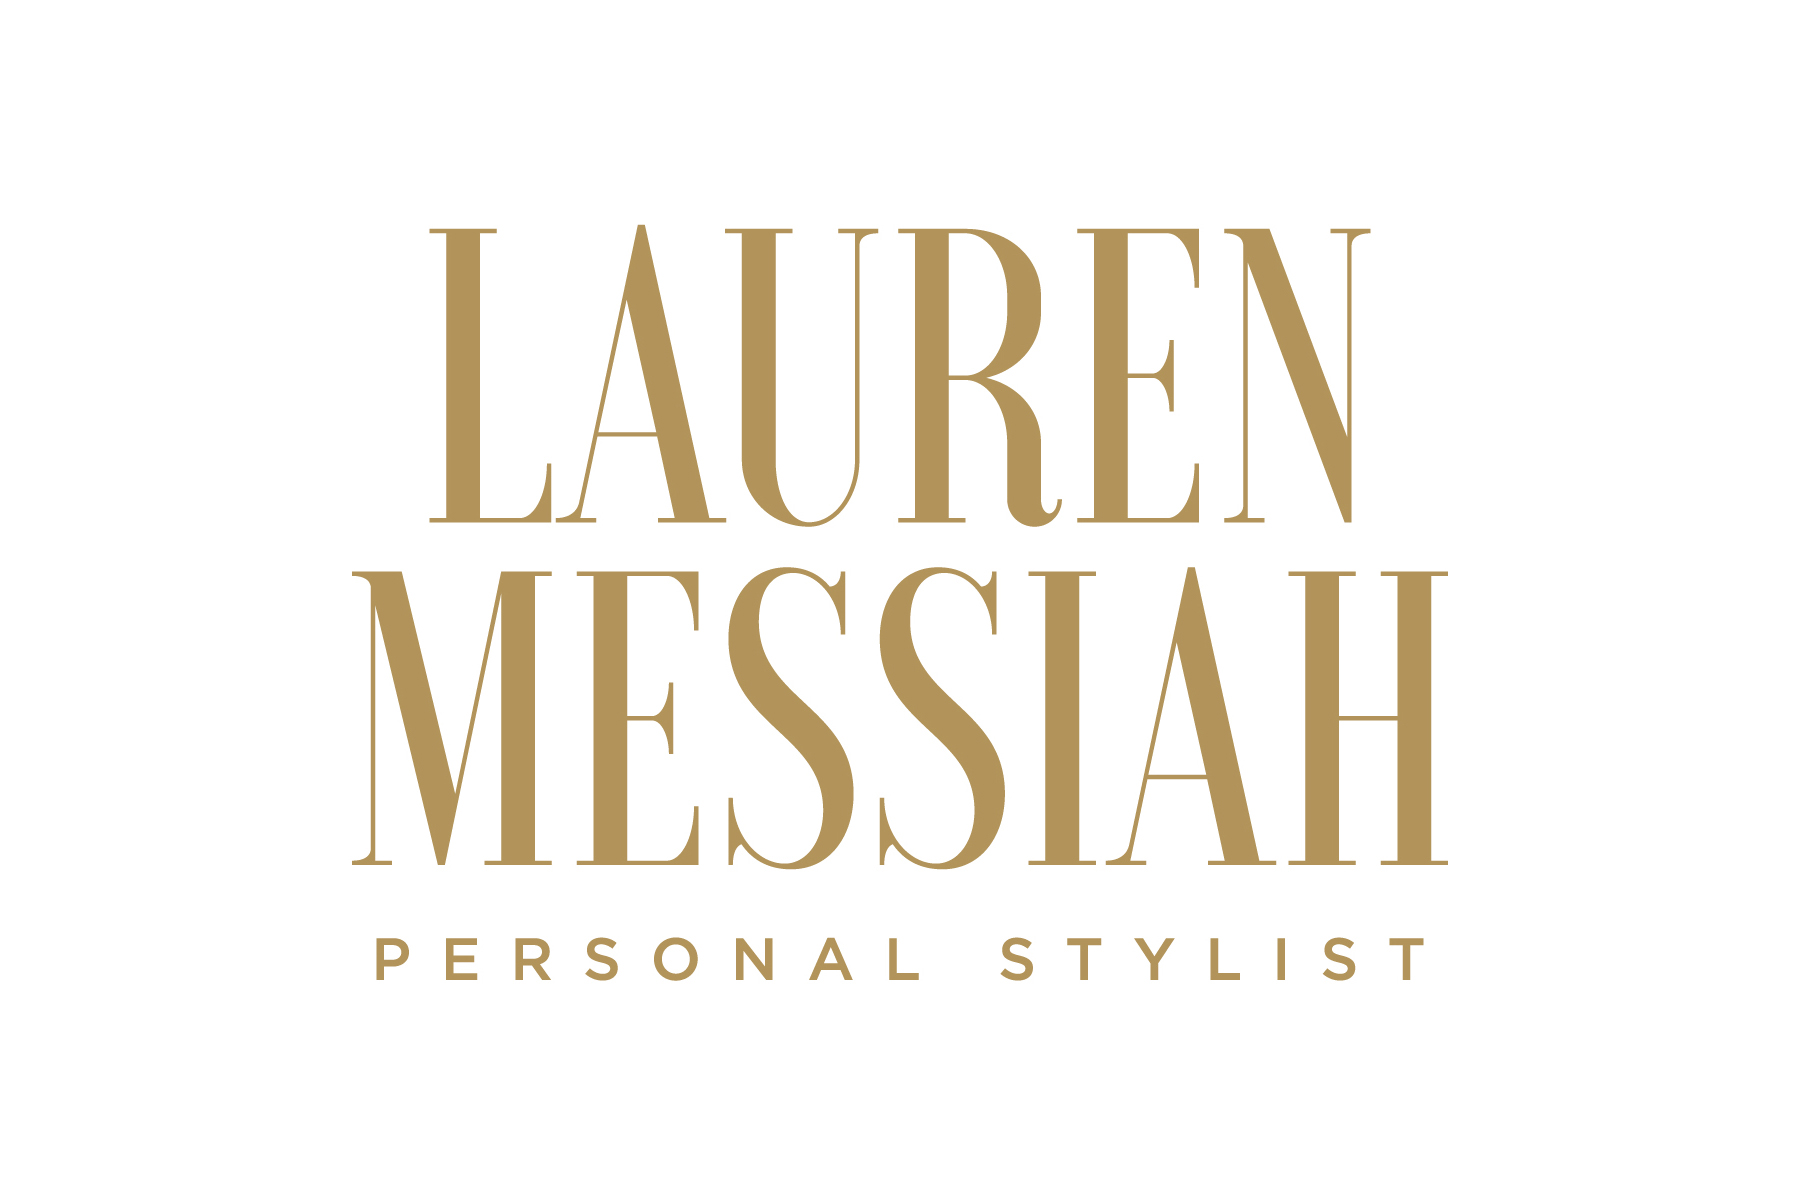 LaurenMessiah15_GoldLogo_morespace.jpg